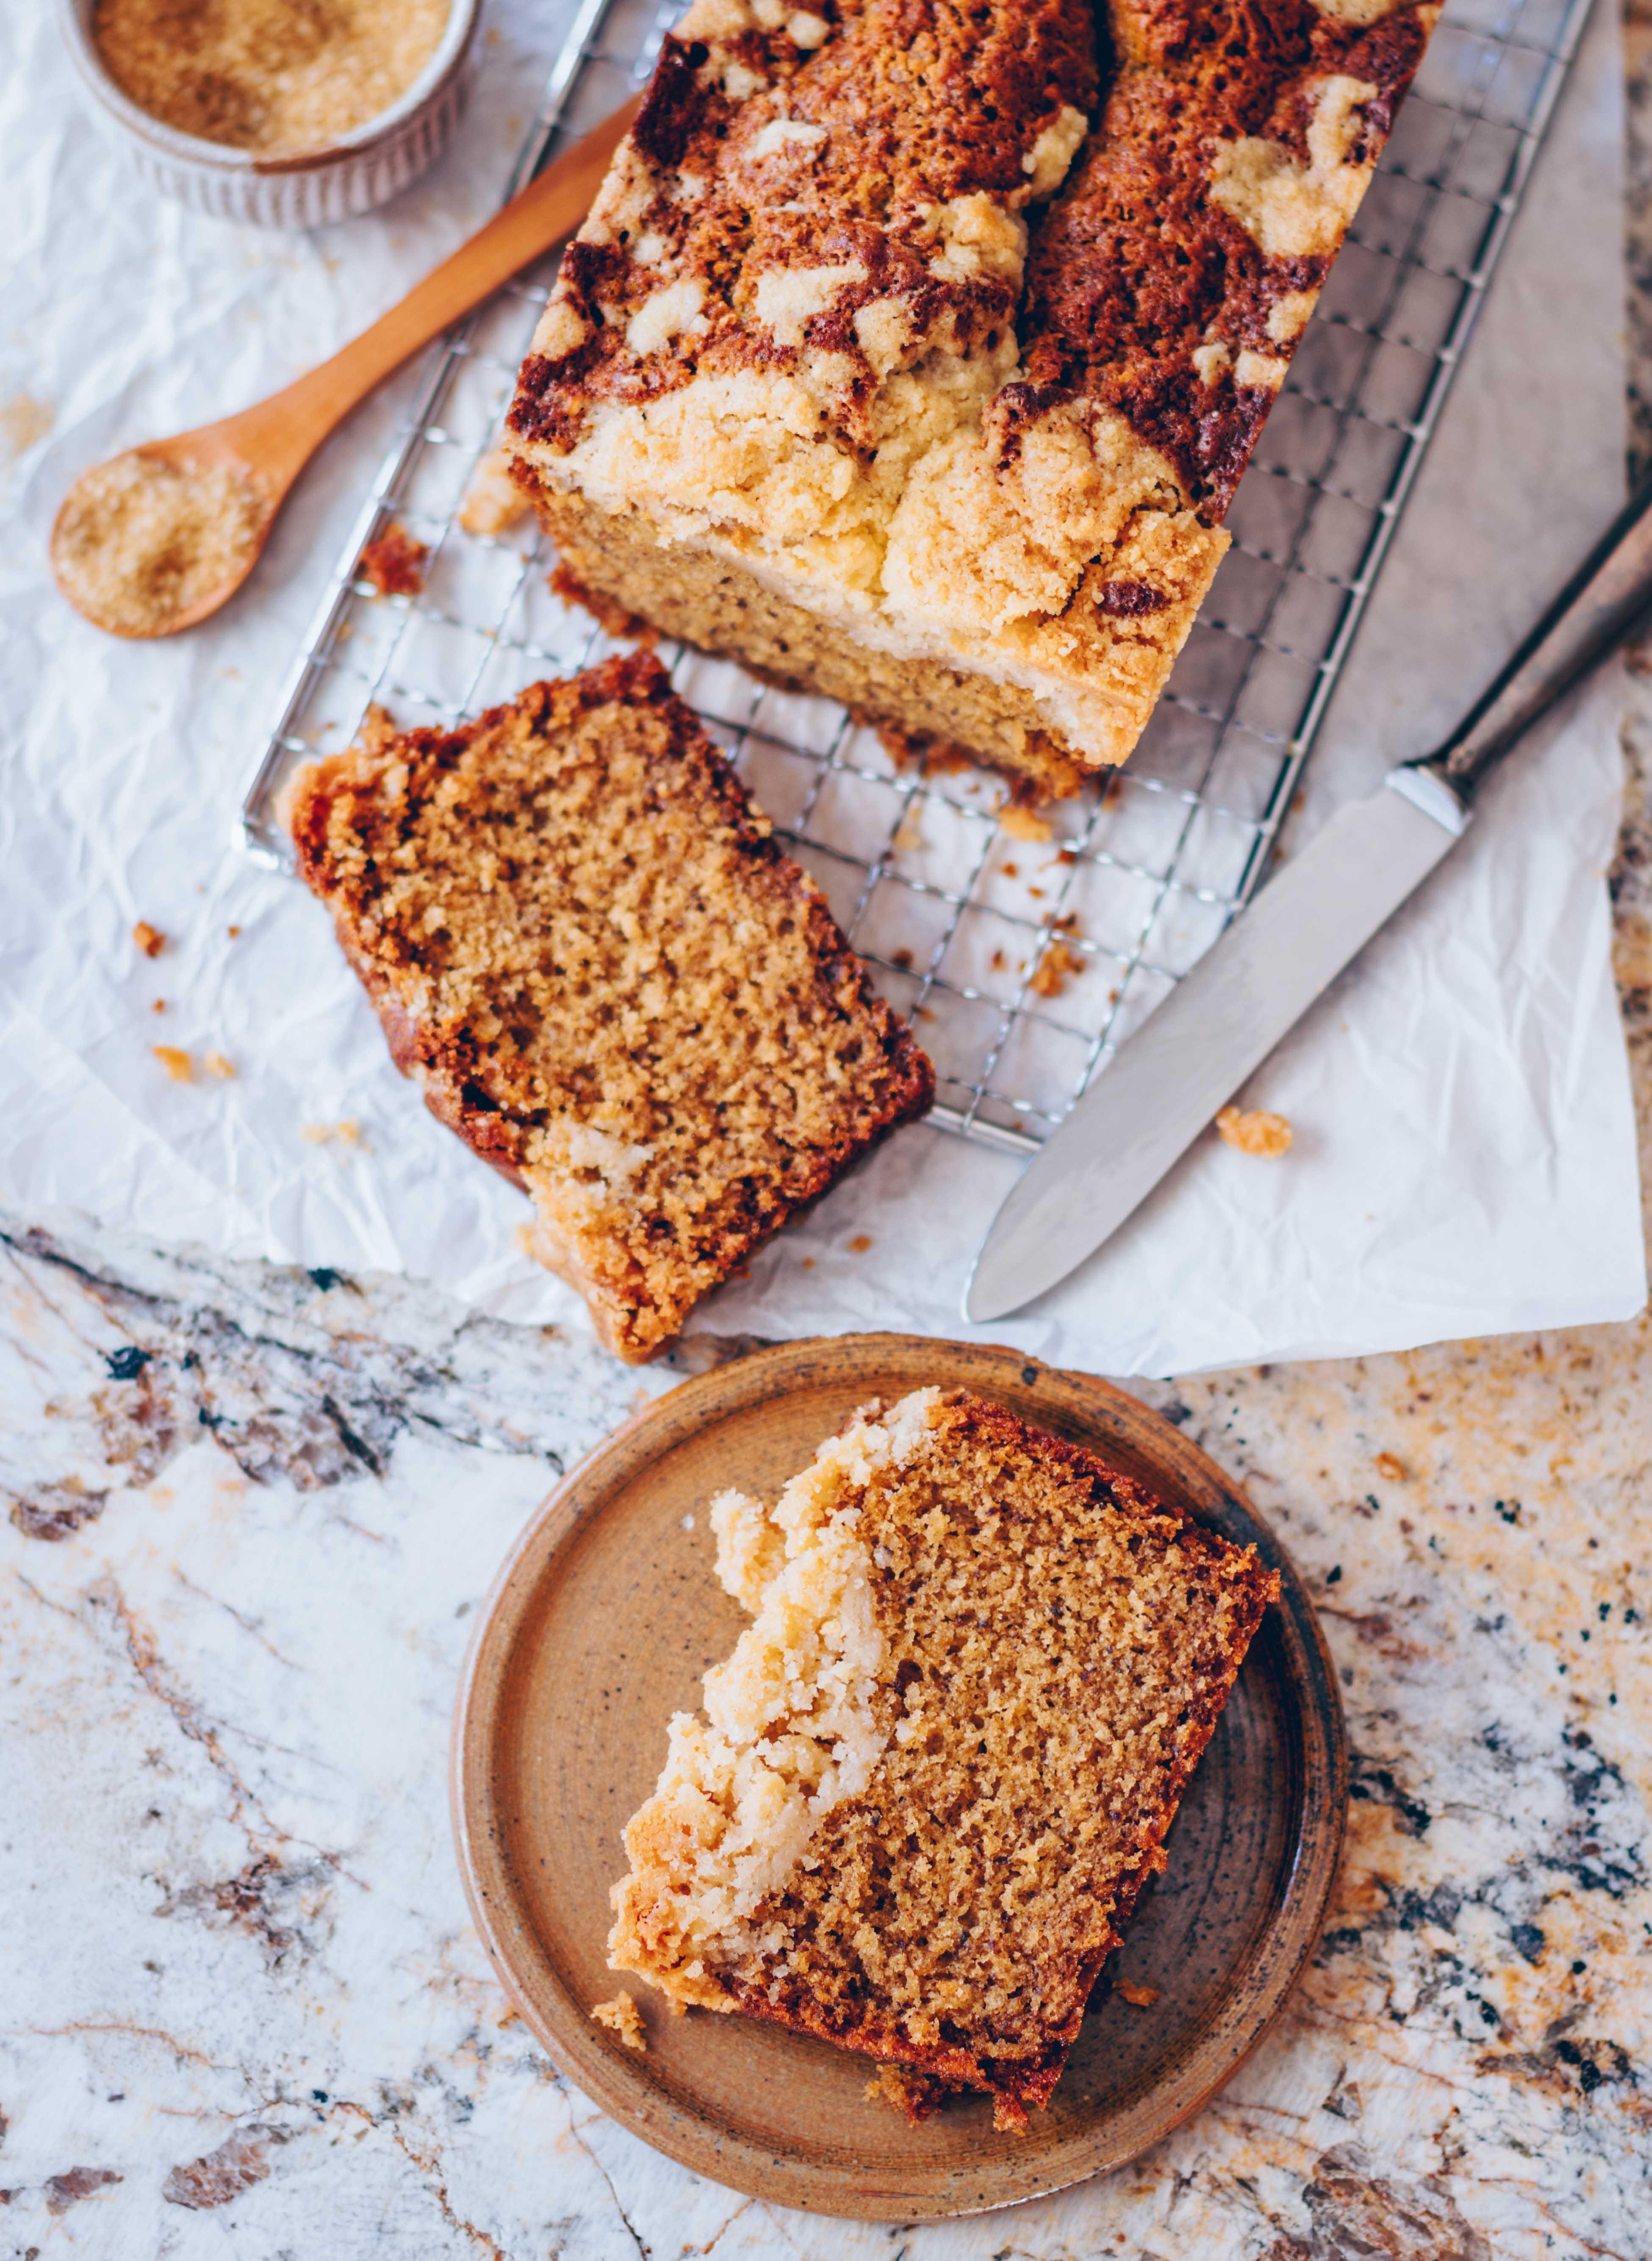 Earl Grey Cake with cinnamon streusel